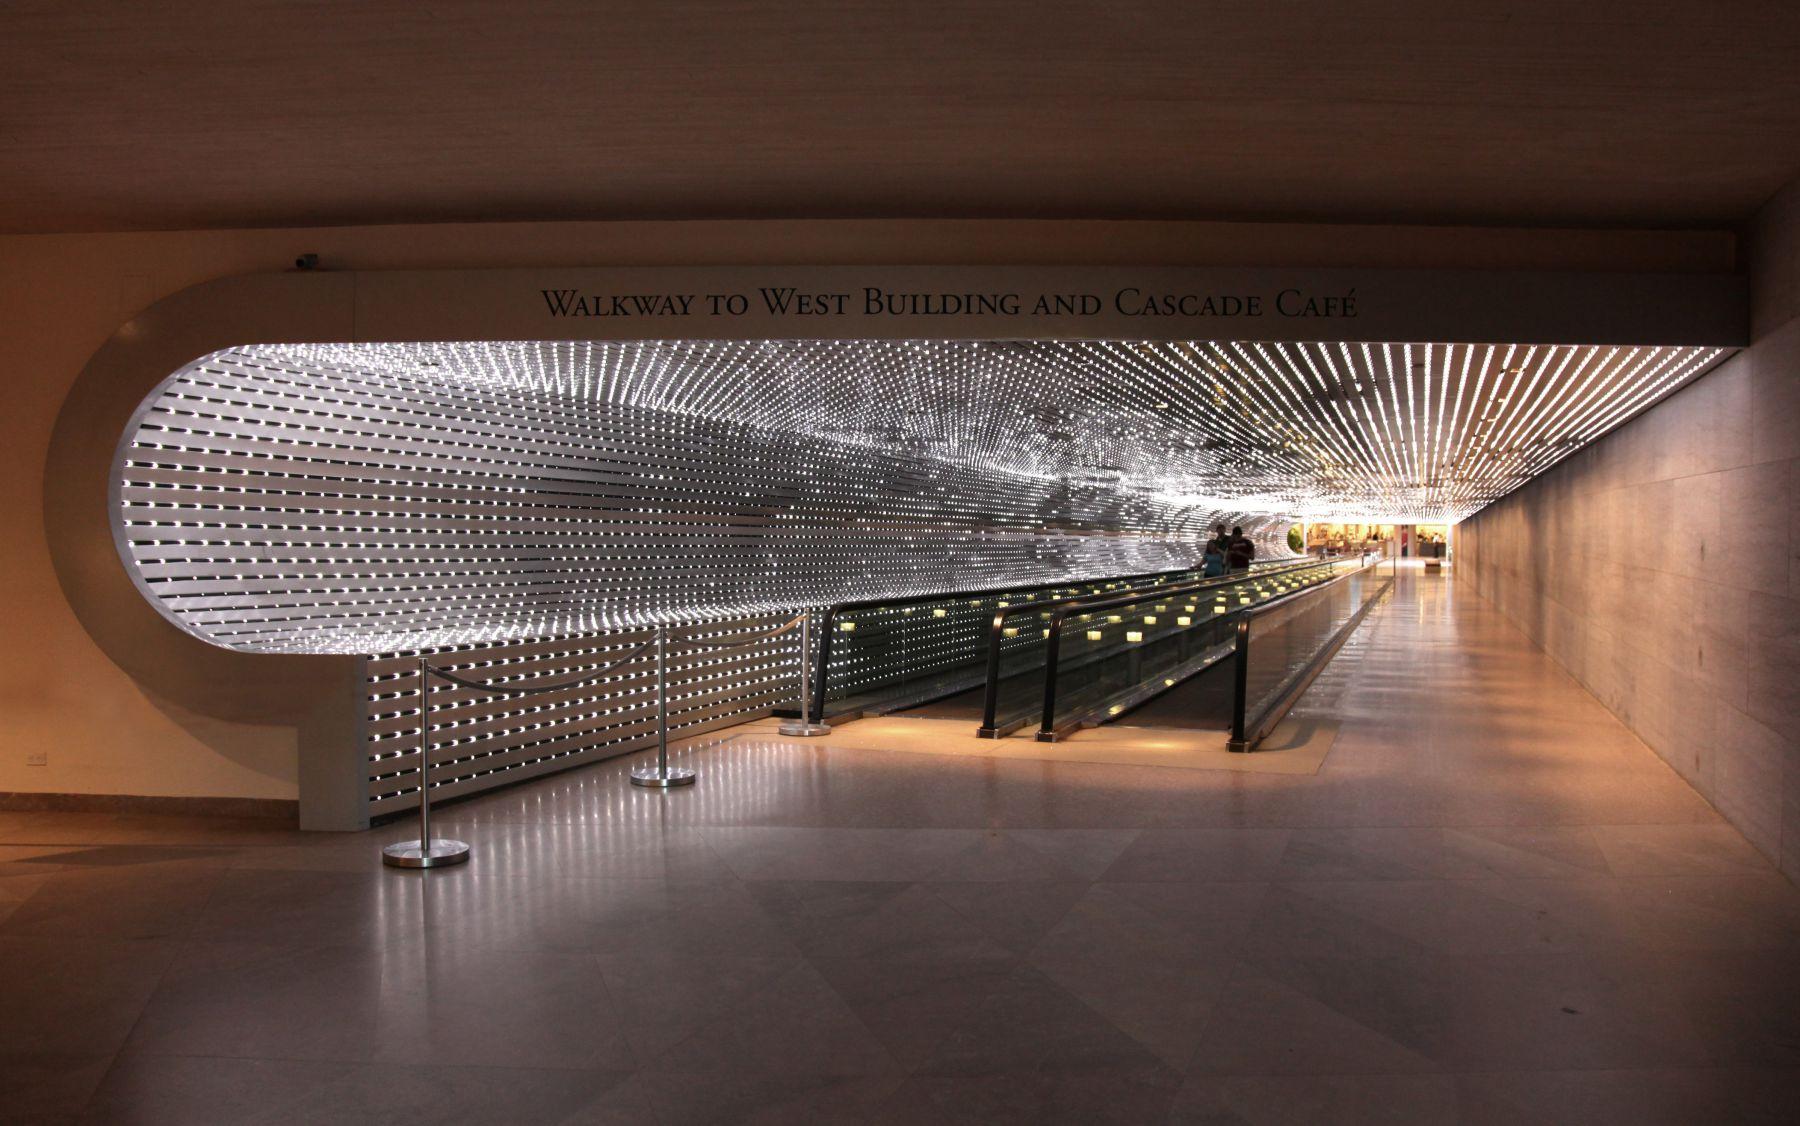 Leo Villareal Multiverse Permanent installation: National Gallery of Art, Washington, DC